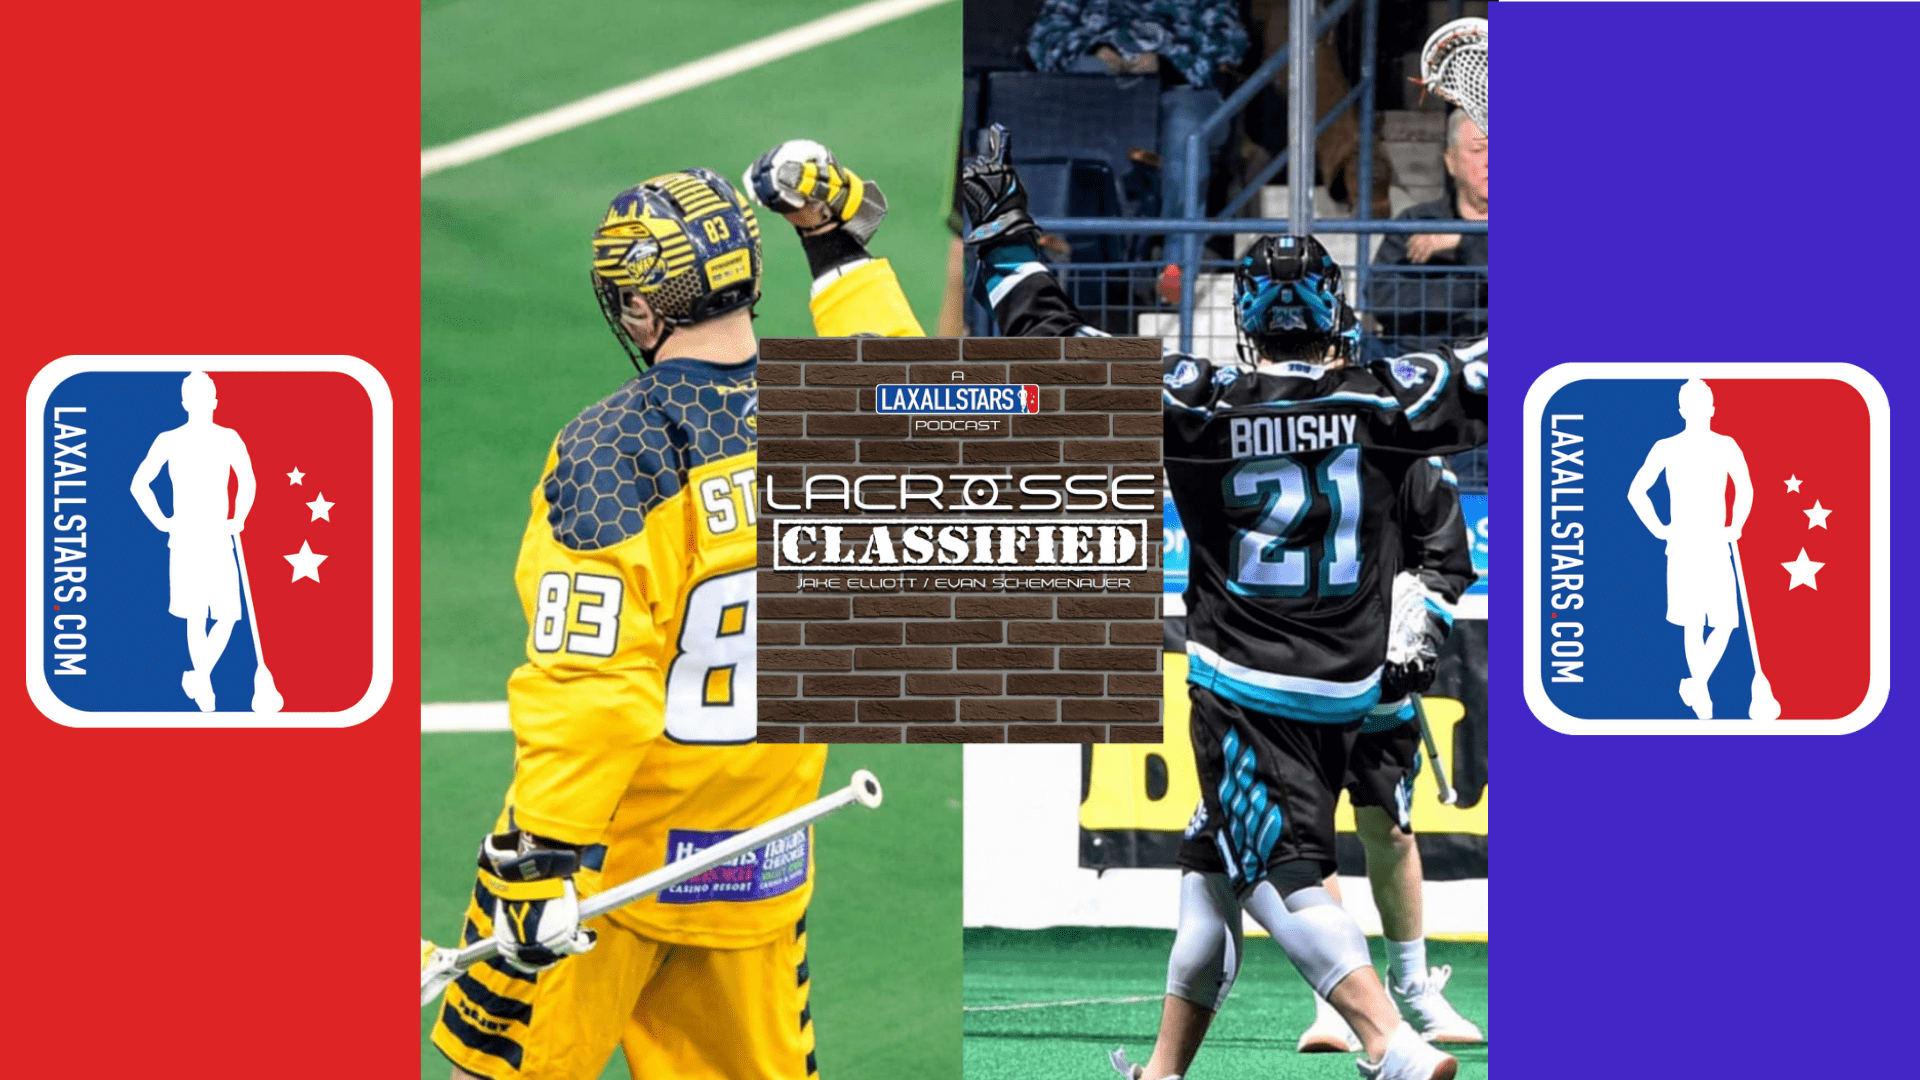 lacrosse classified randy staats chris boushy